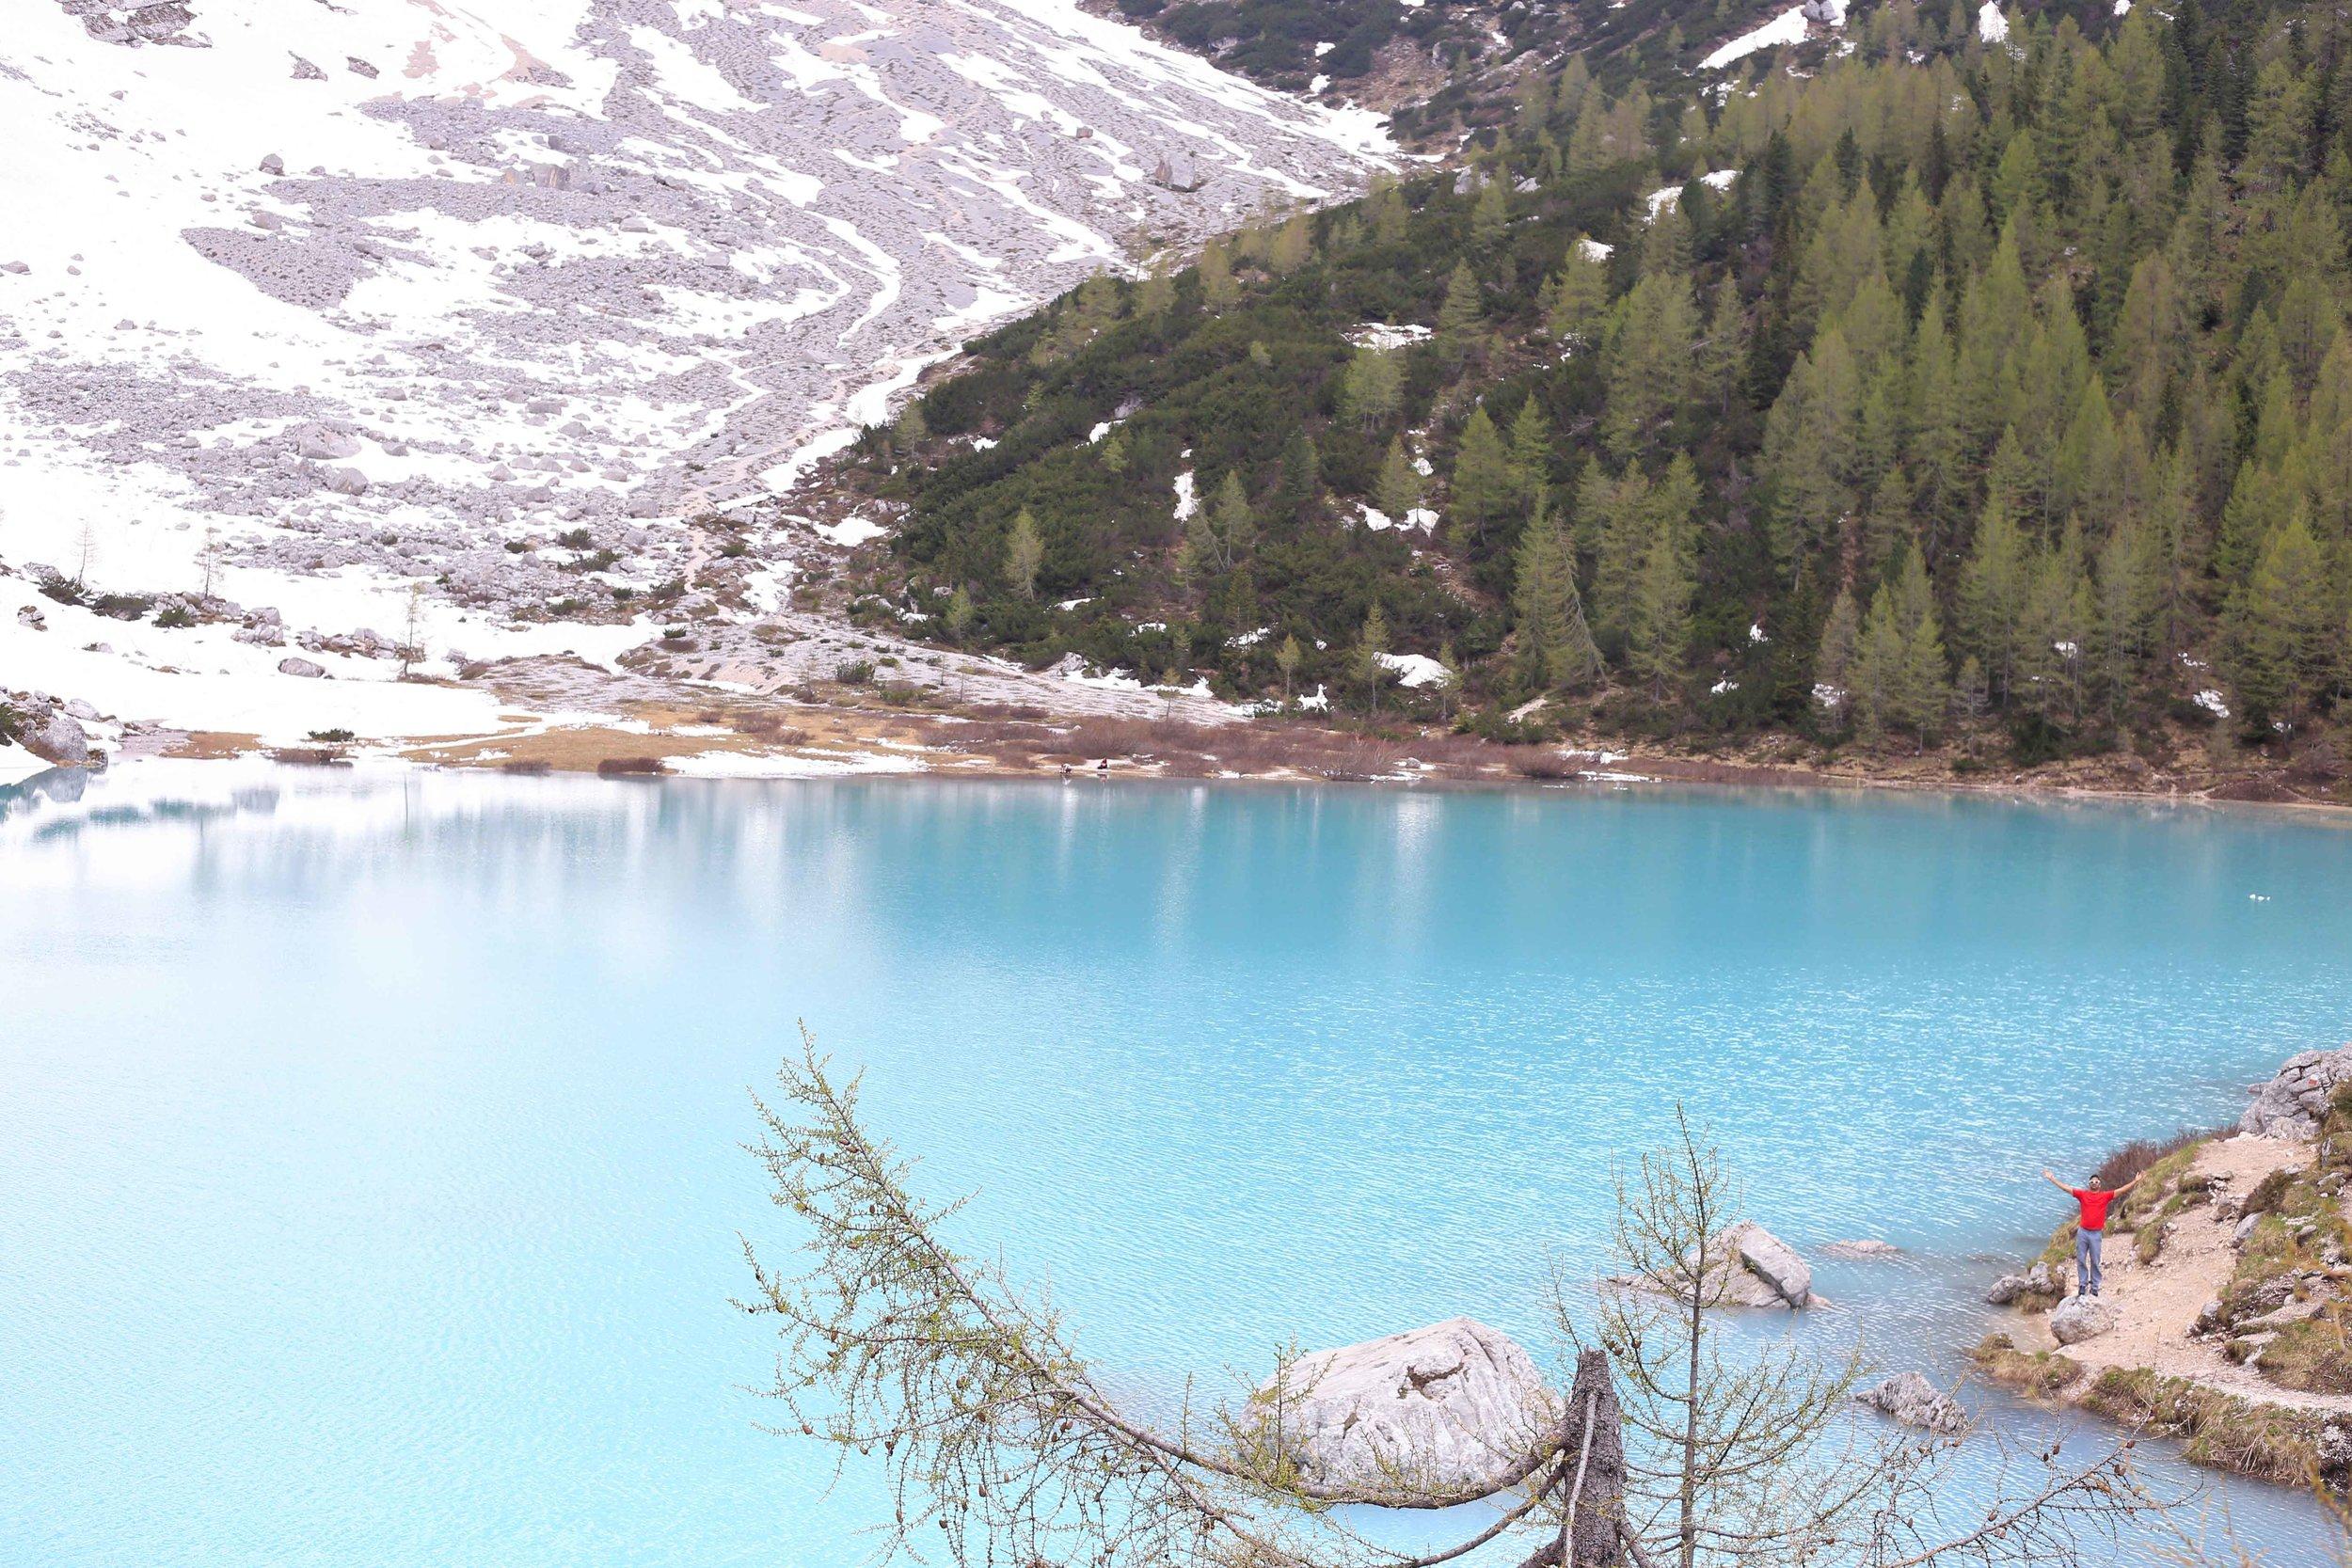 Lago di Sorapis is seriously gorgeous y'all.